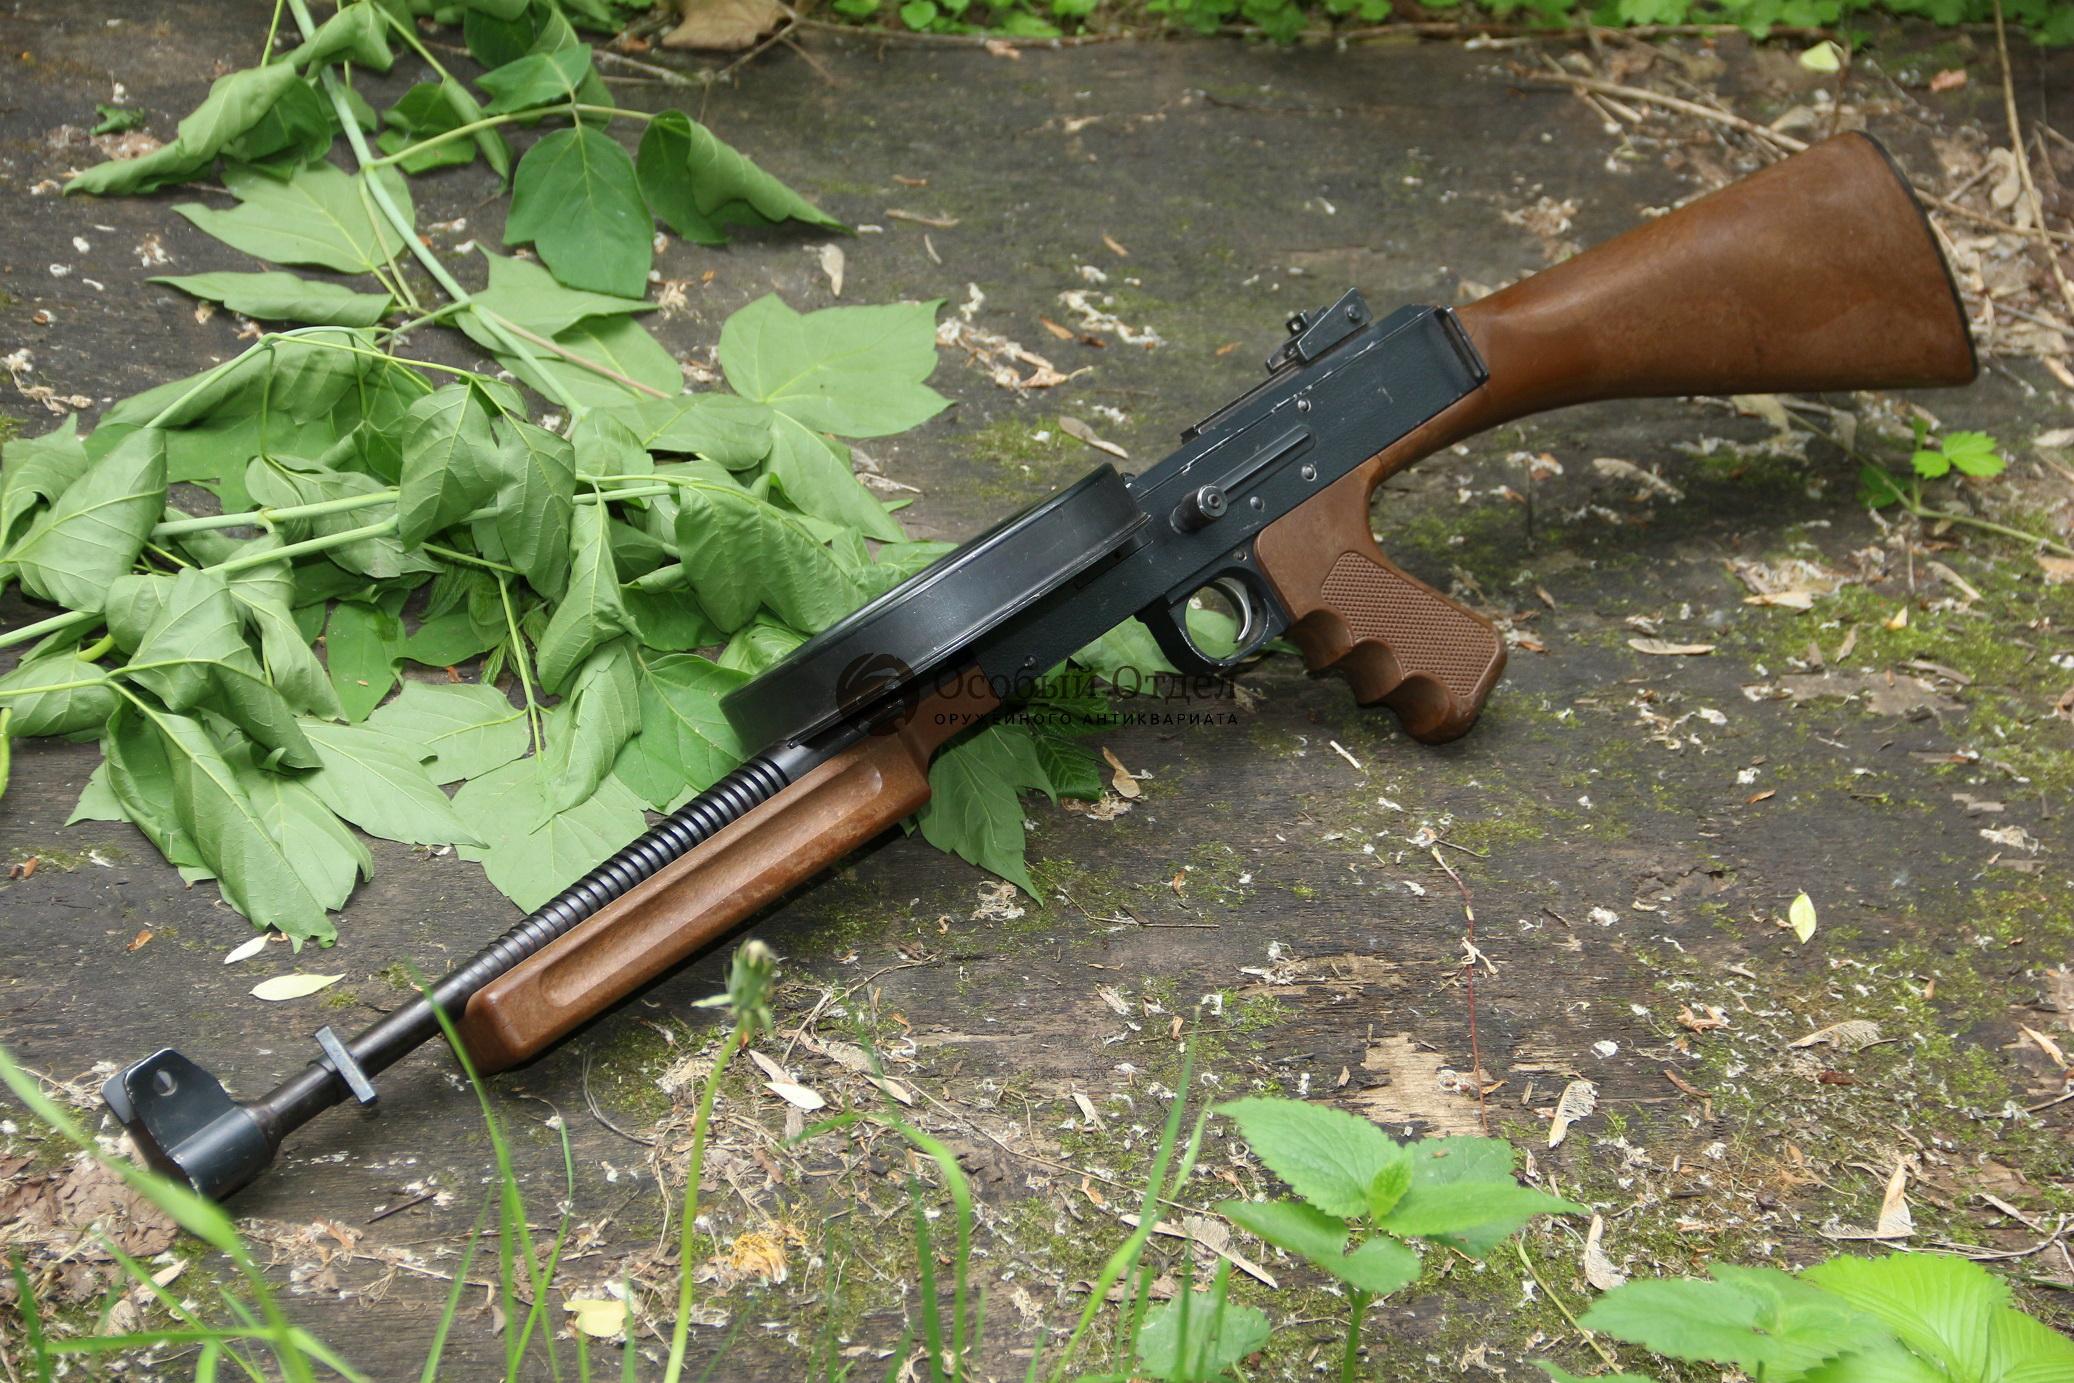 Фото Пистолет-пулемет American 180 Cal. 22l.r. 1974 год выпуска, #А004594